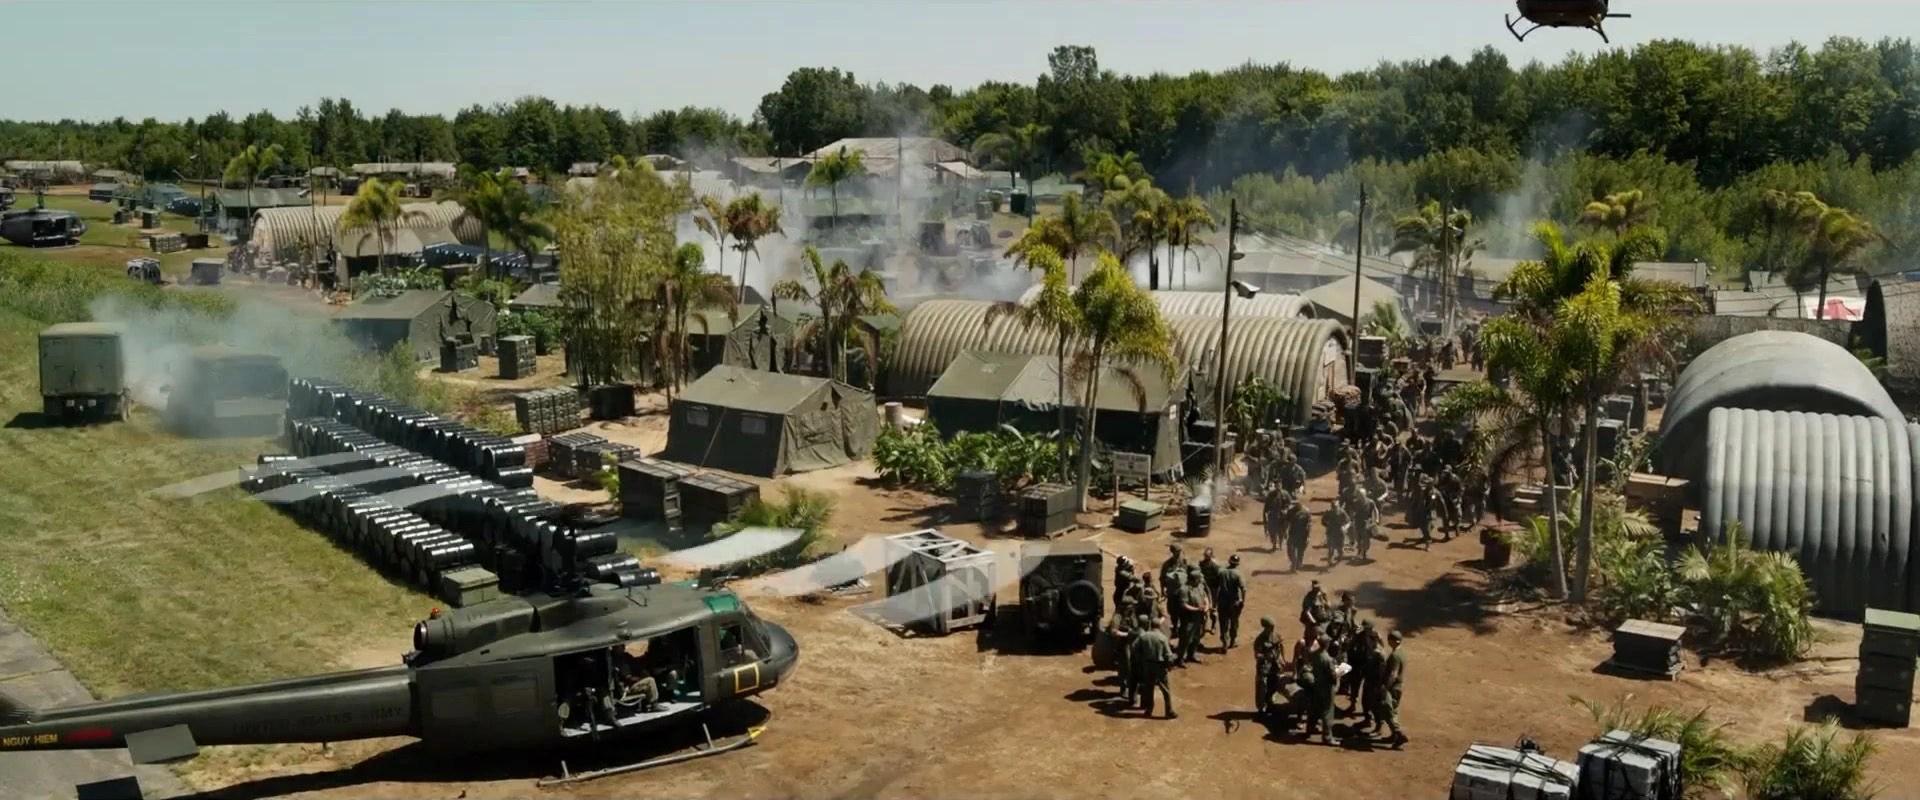 Nigerian Army Camp in Bauchi